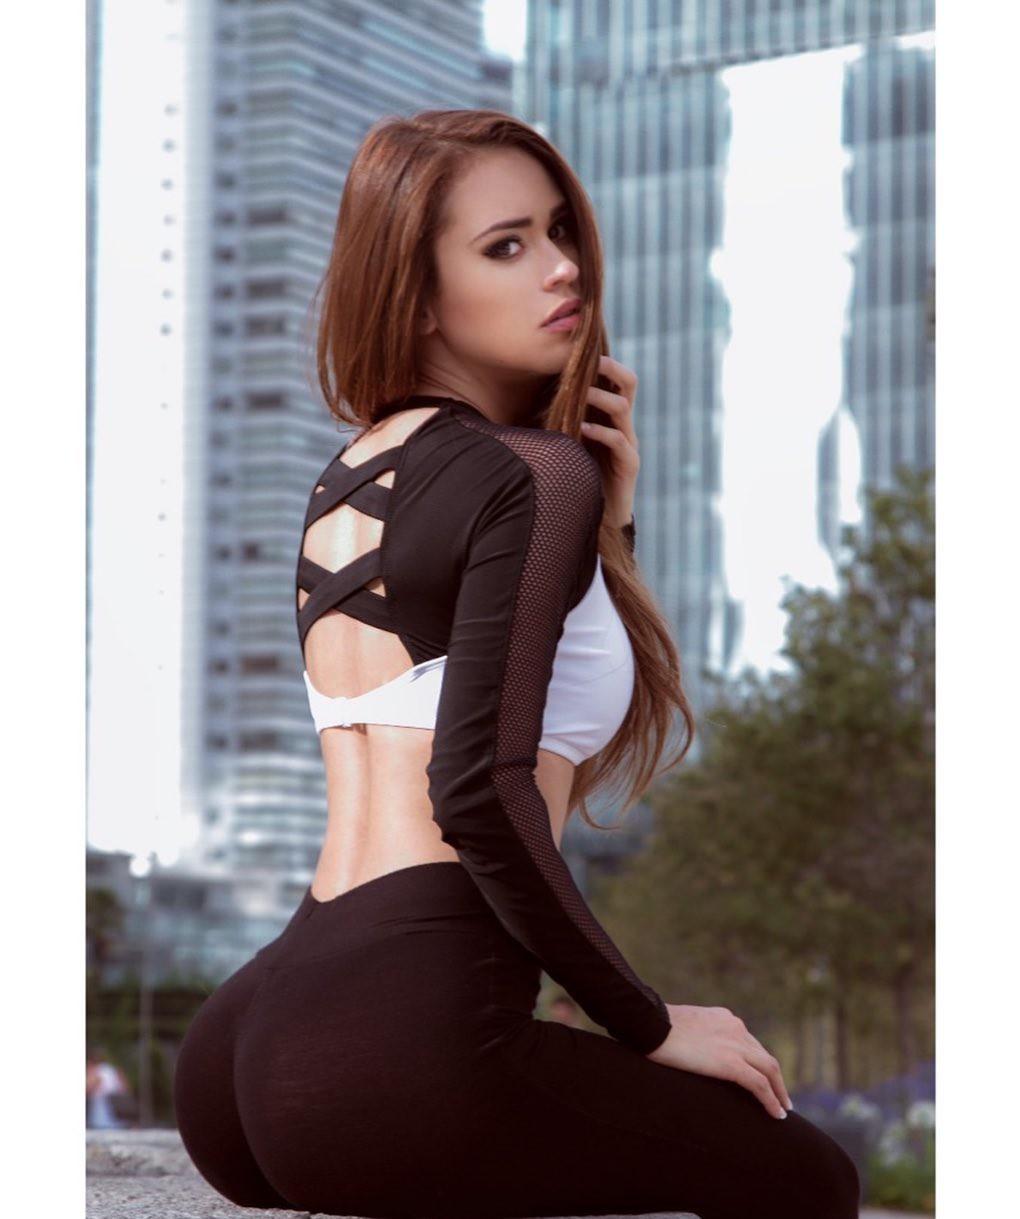 Sexy Instagram Photo Shoot Of Actress Yanet Garcia Yanet Garcia